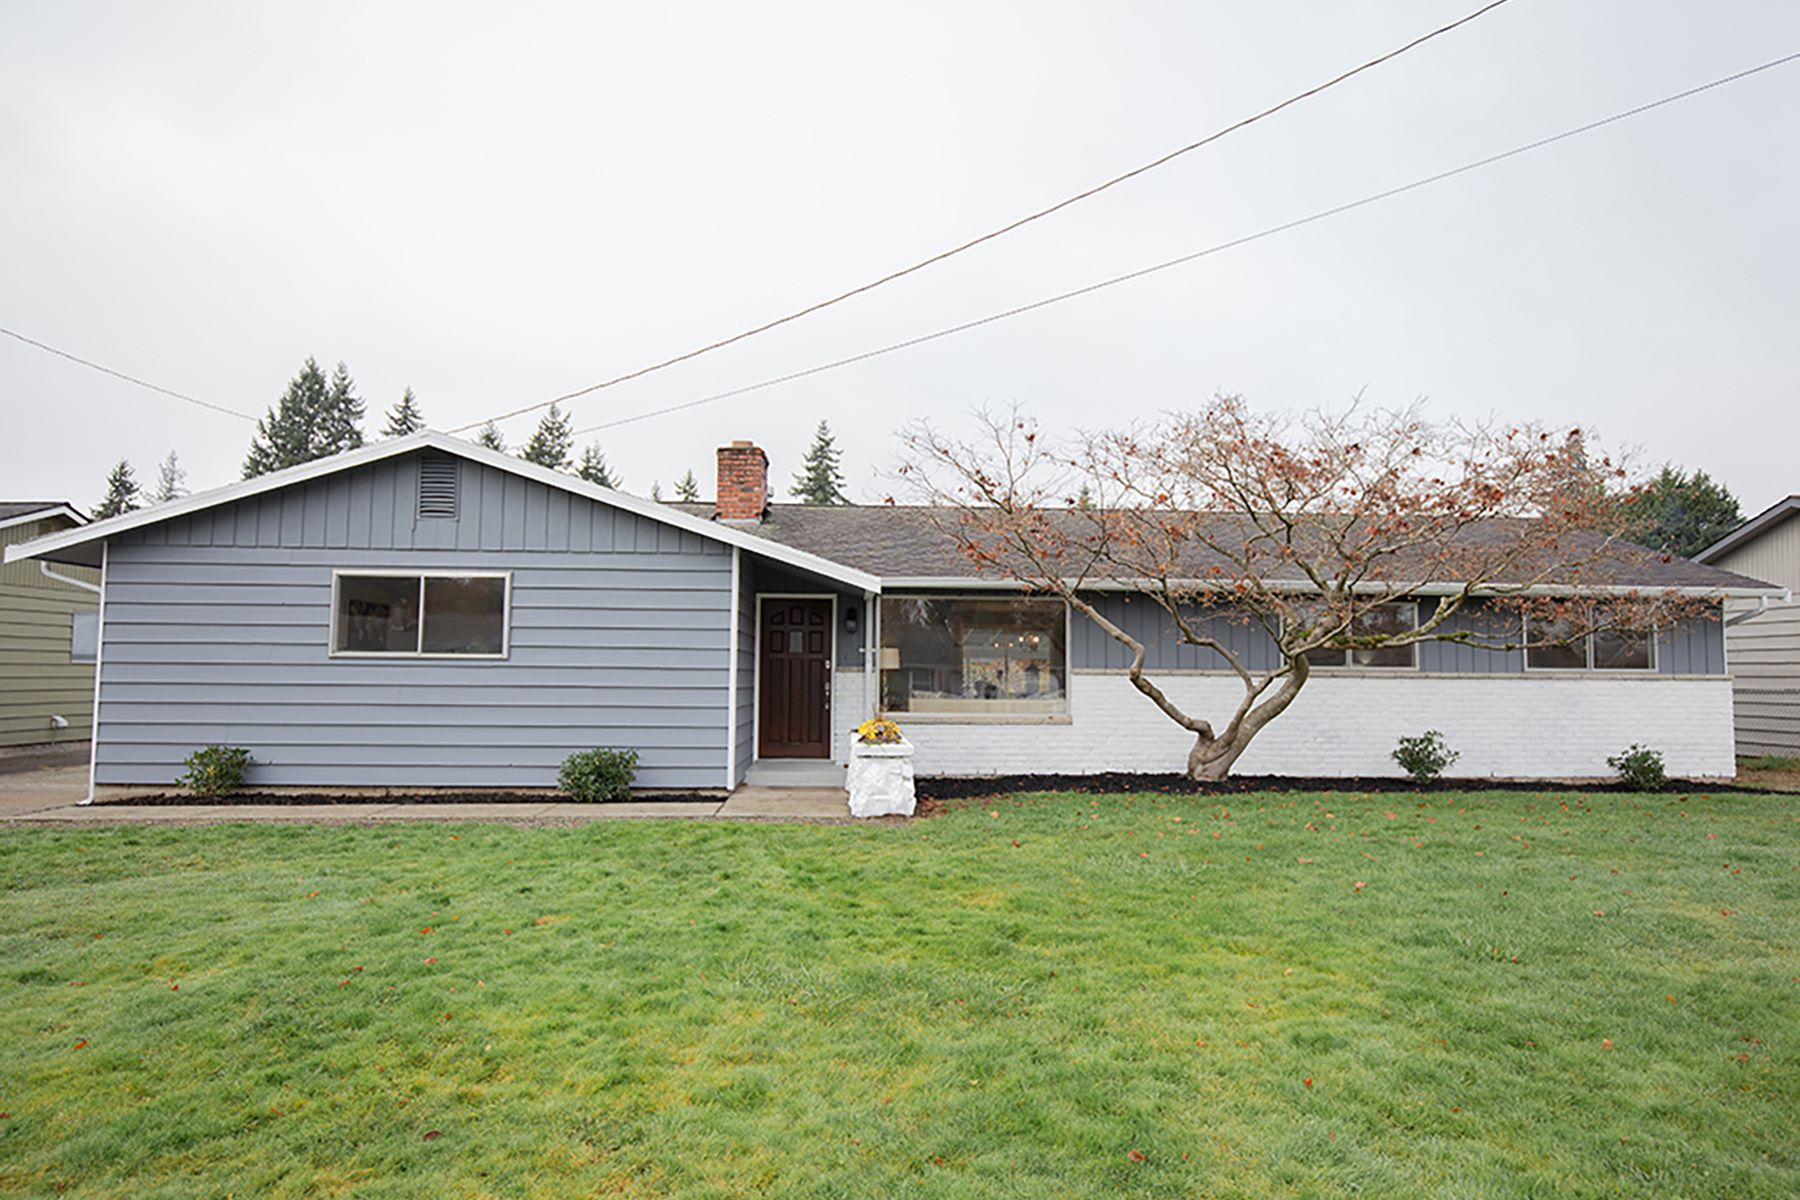 Single Family Homes for Sale at Marysville Rambler 8506 45th Dr NE Marysville, Washington 98270 United States